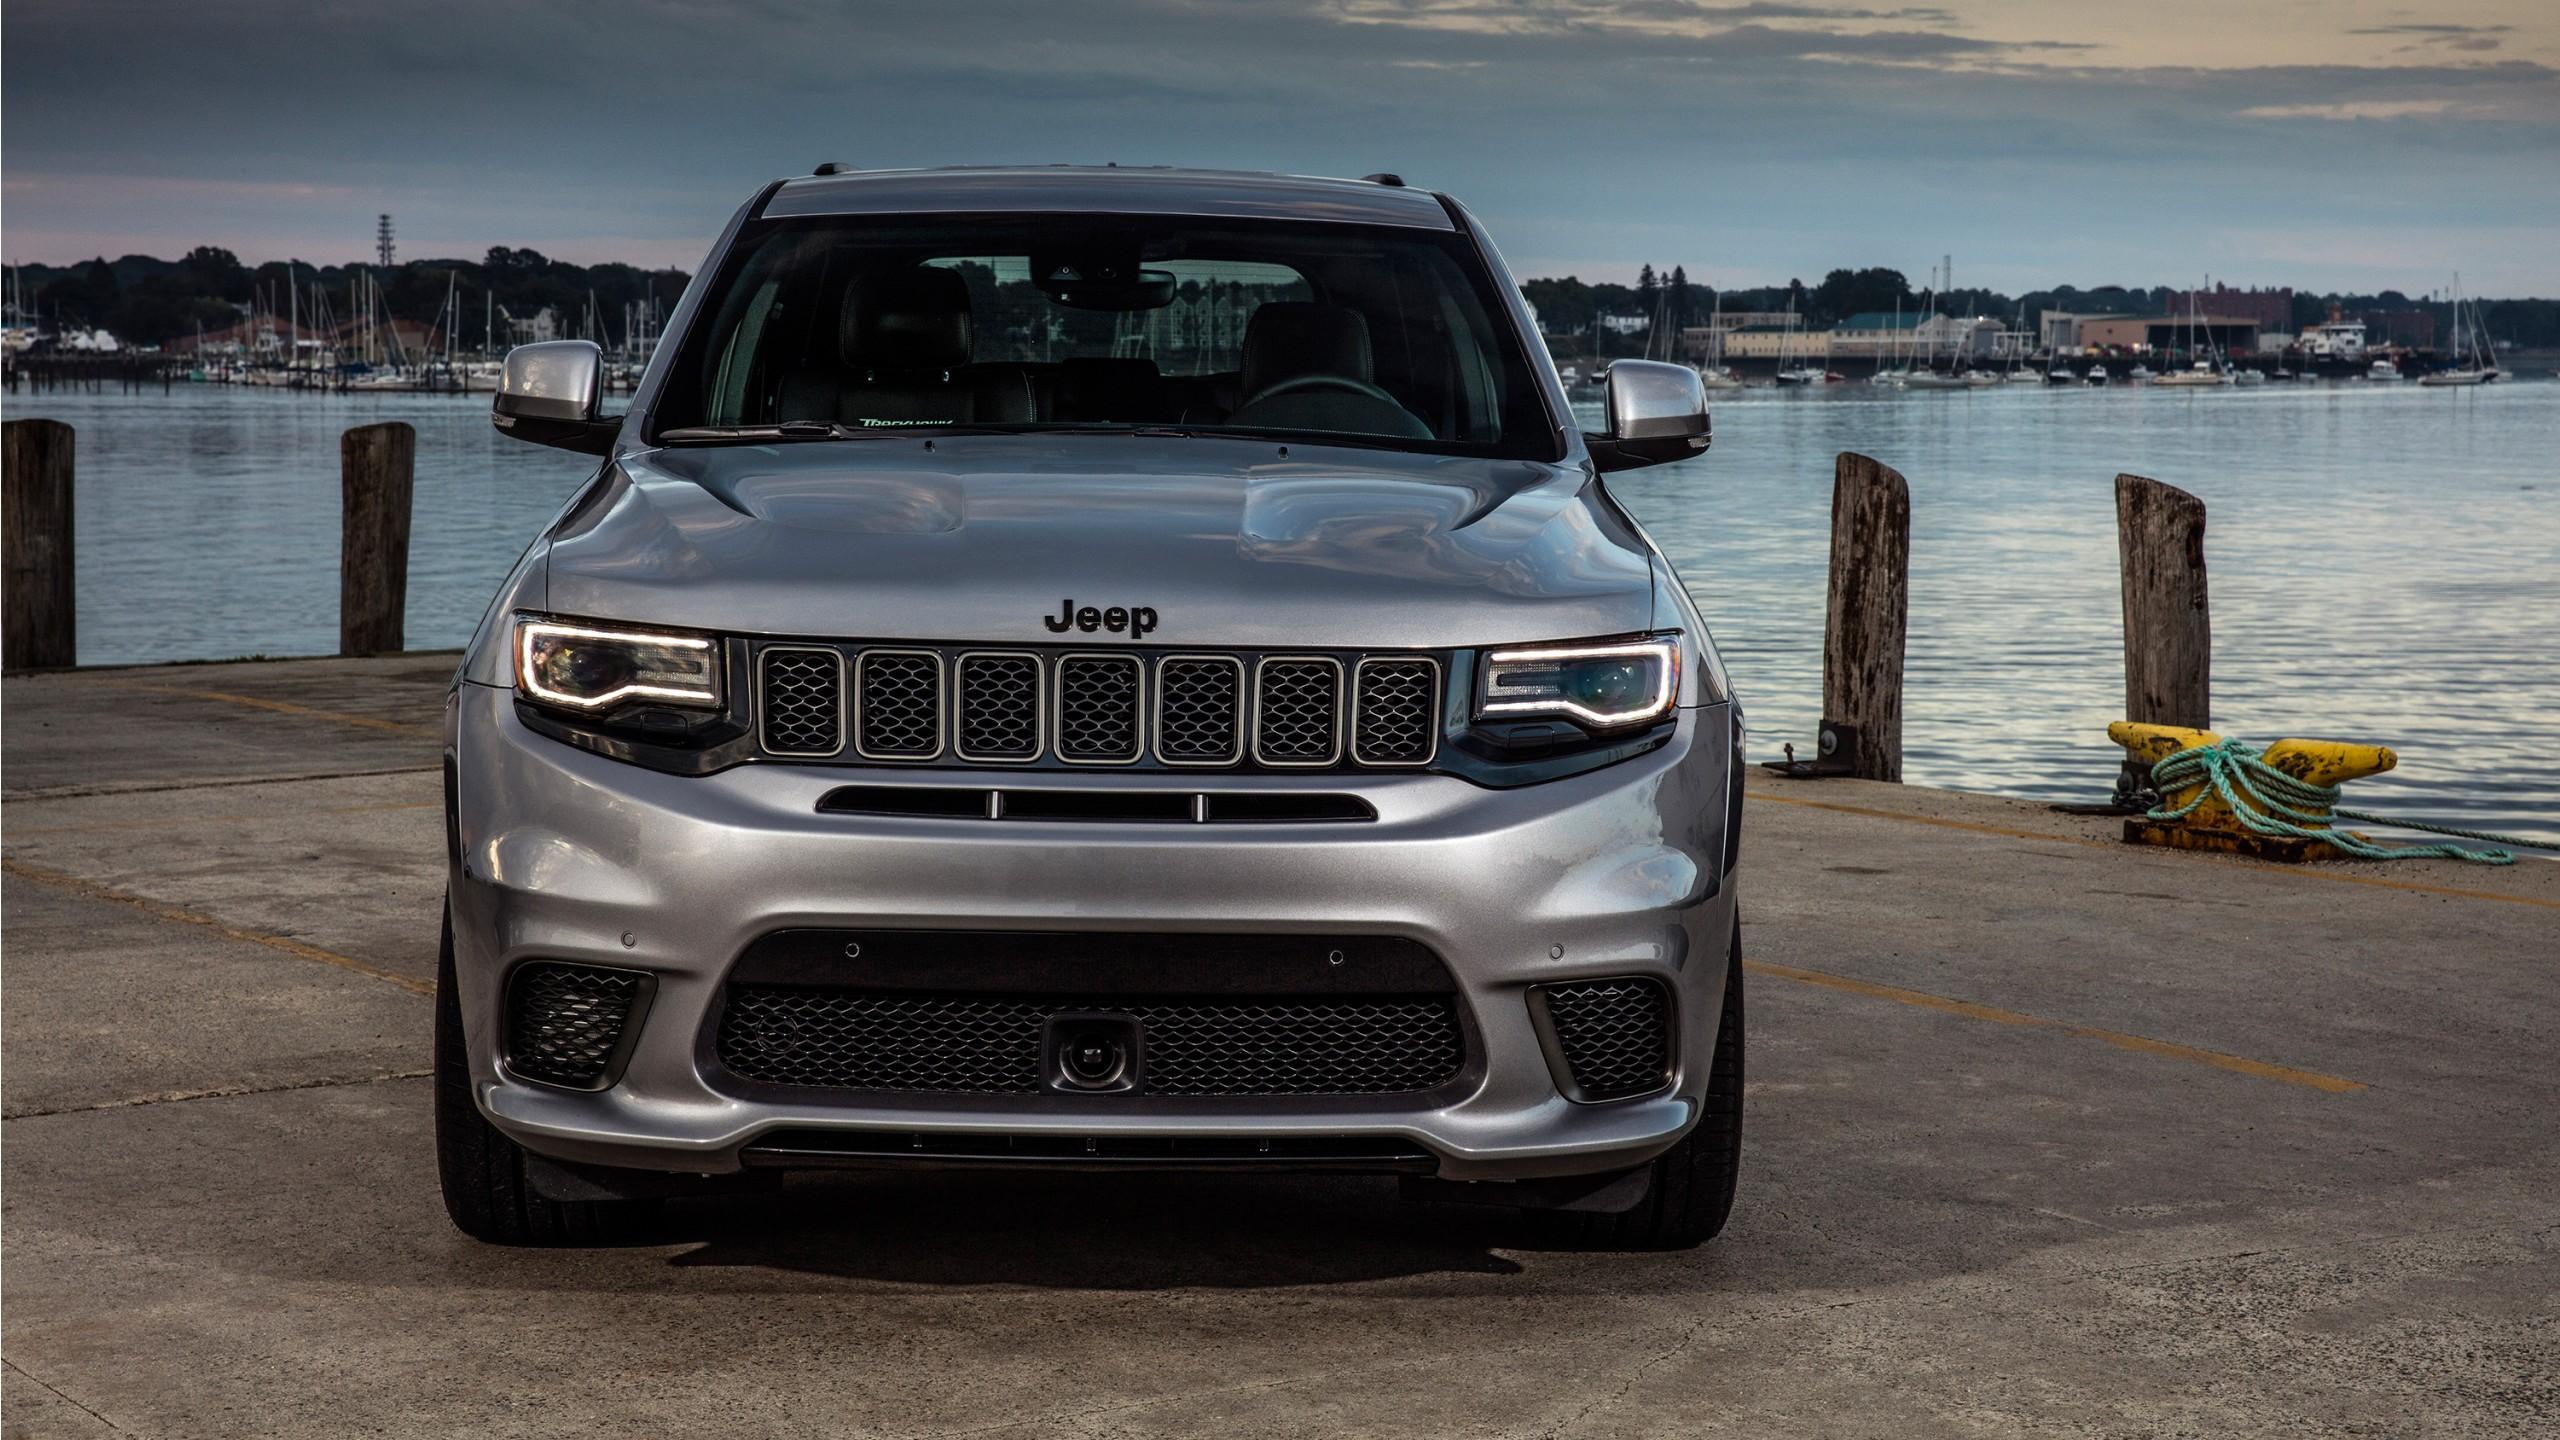 2018 Jeep Grand Cherokee Trackhawk 3 Wallpaper | HD Car ...